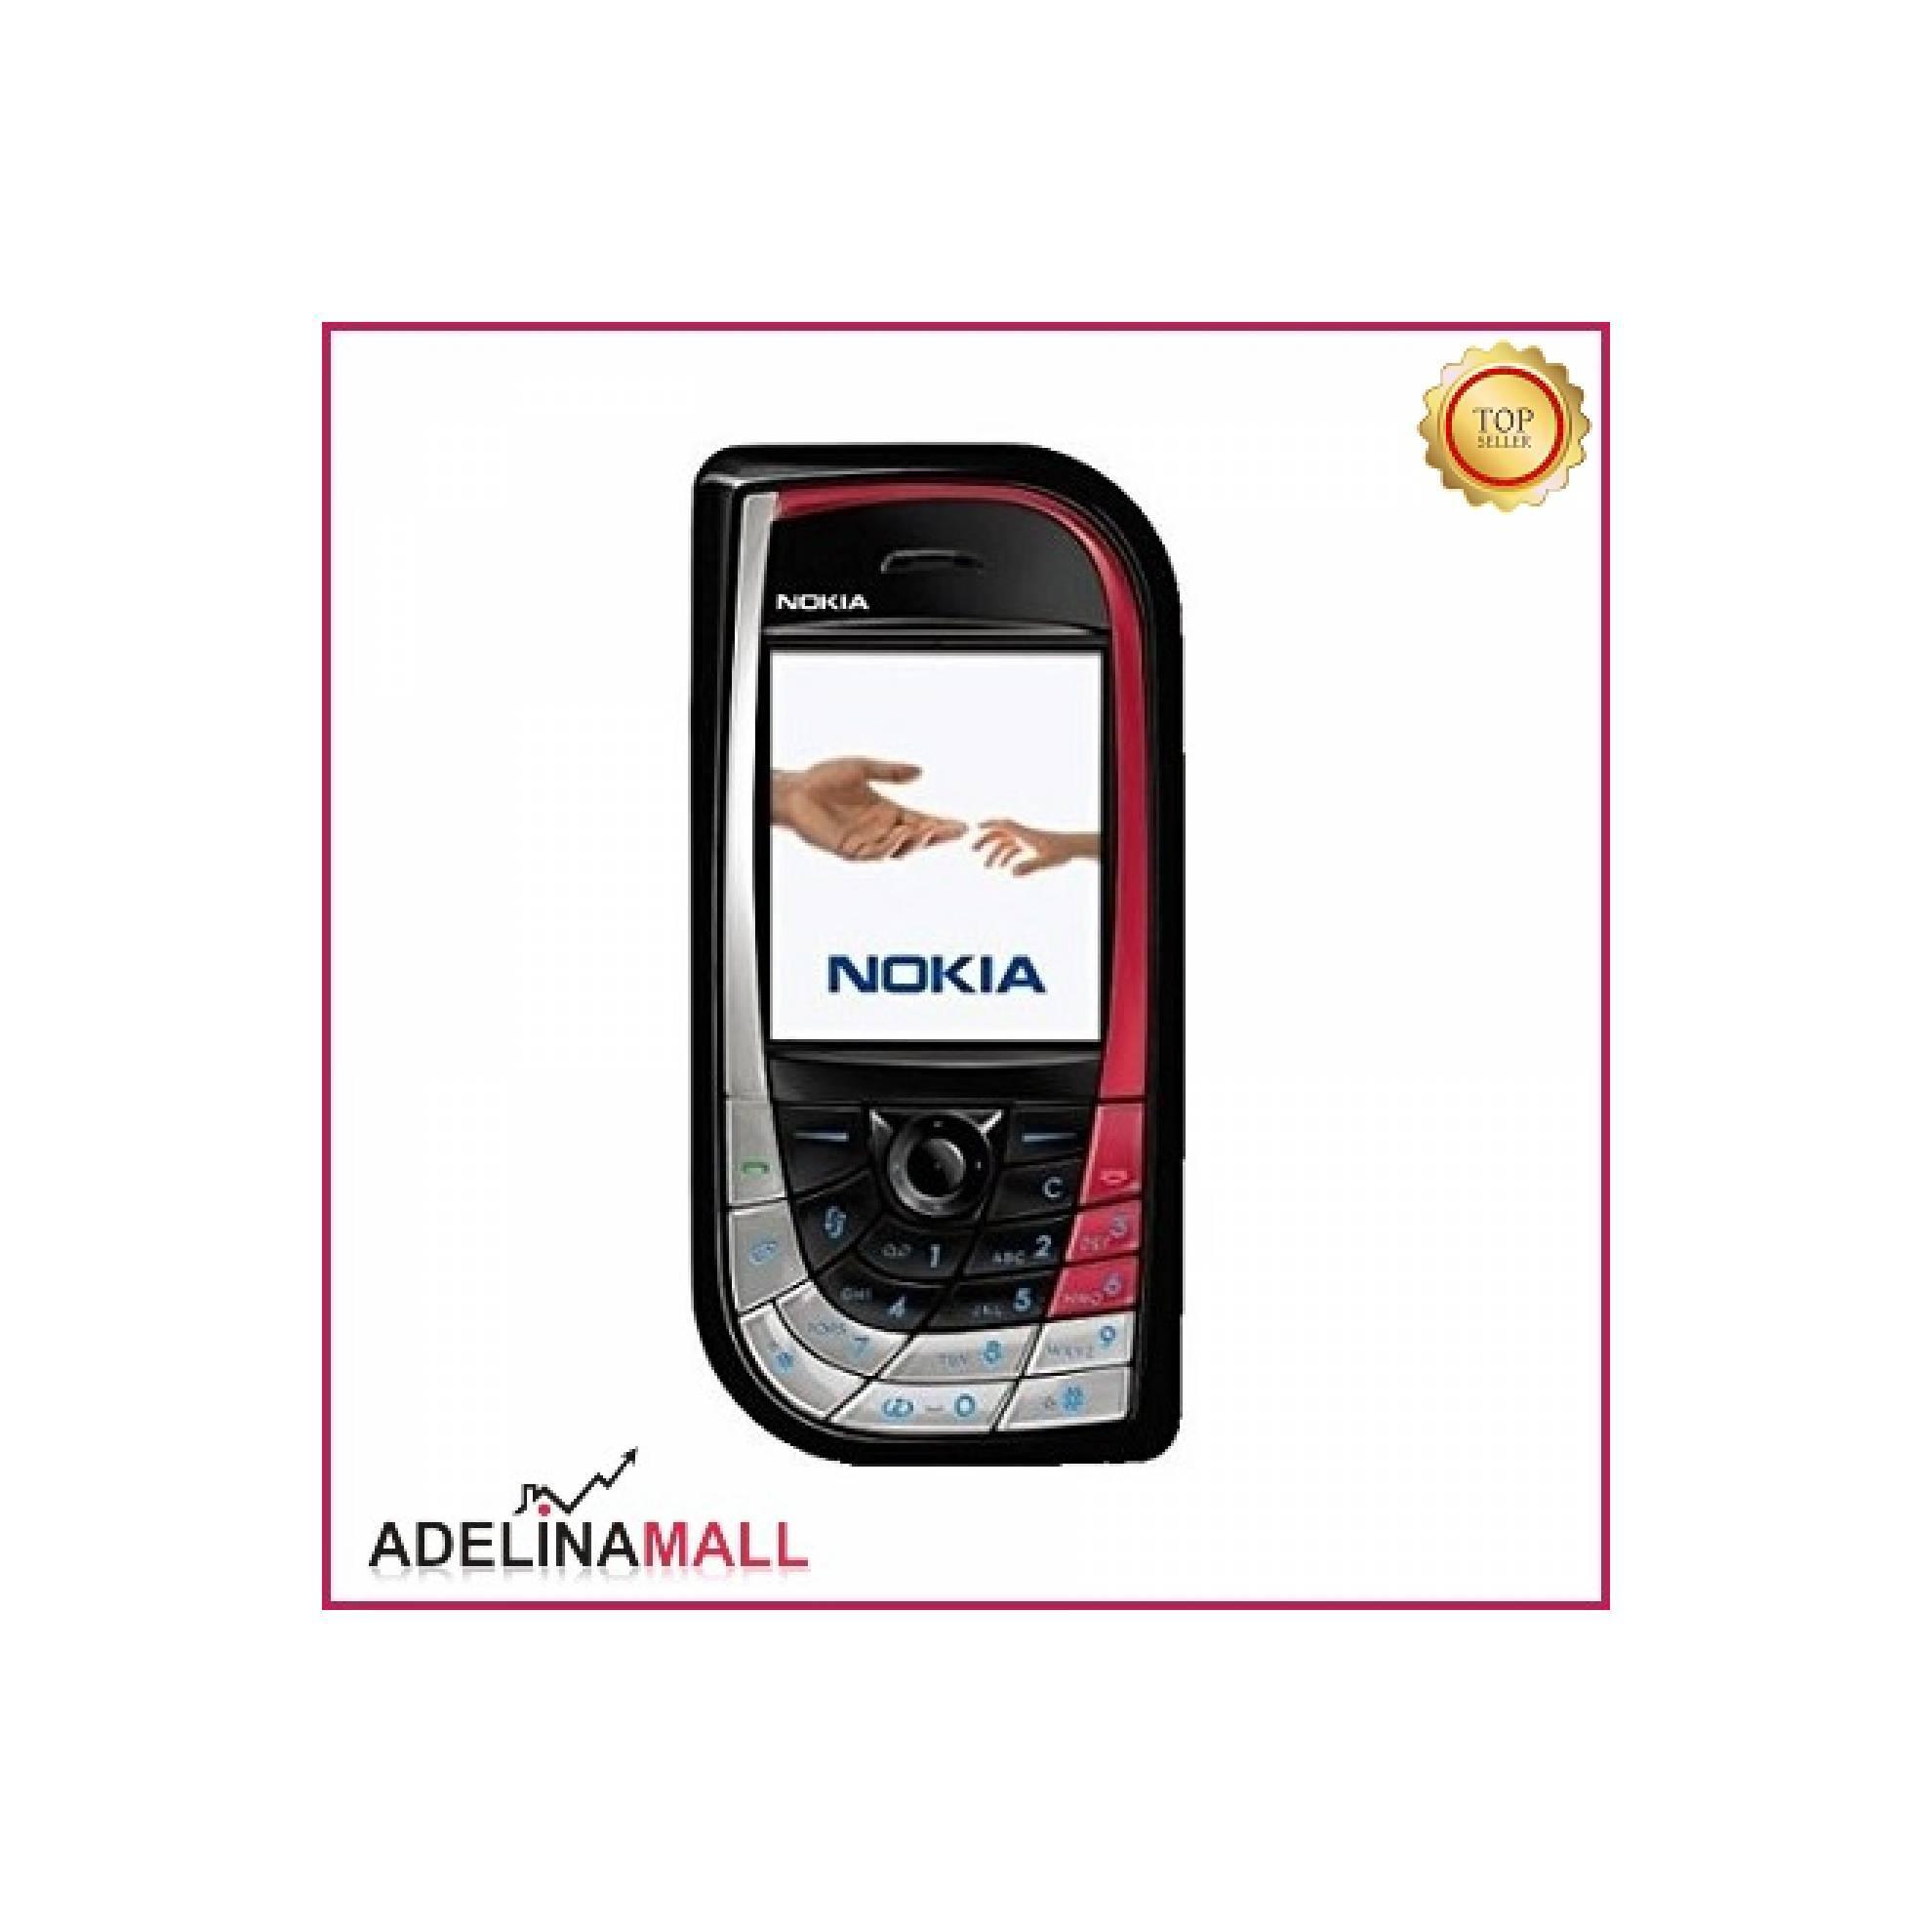 Nokia 7610 Nokia Ketupat Nokia Jadul